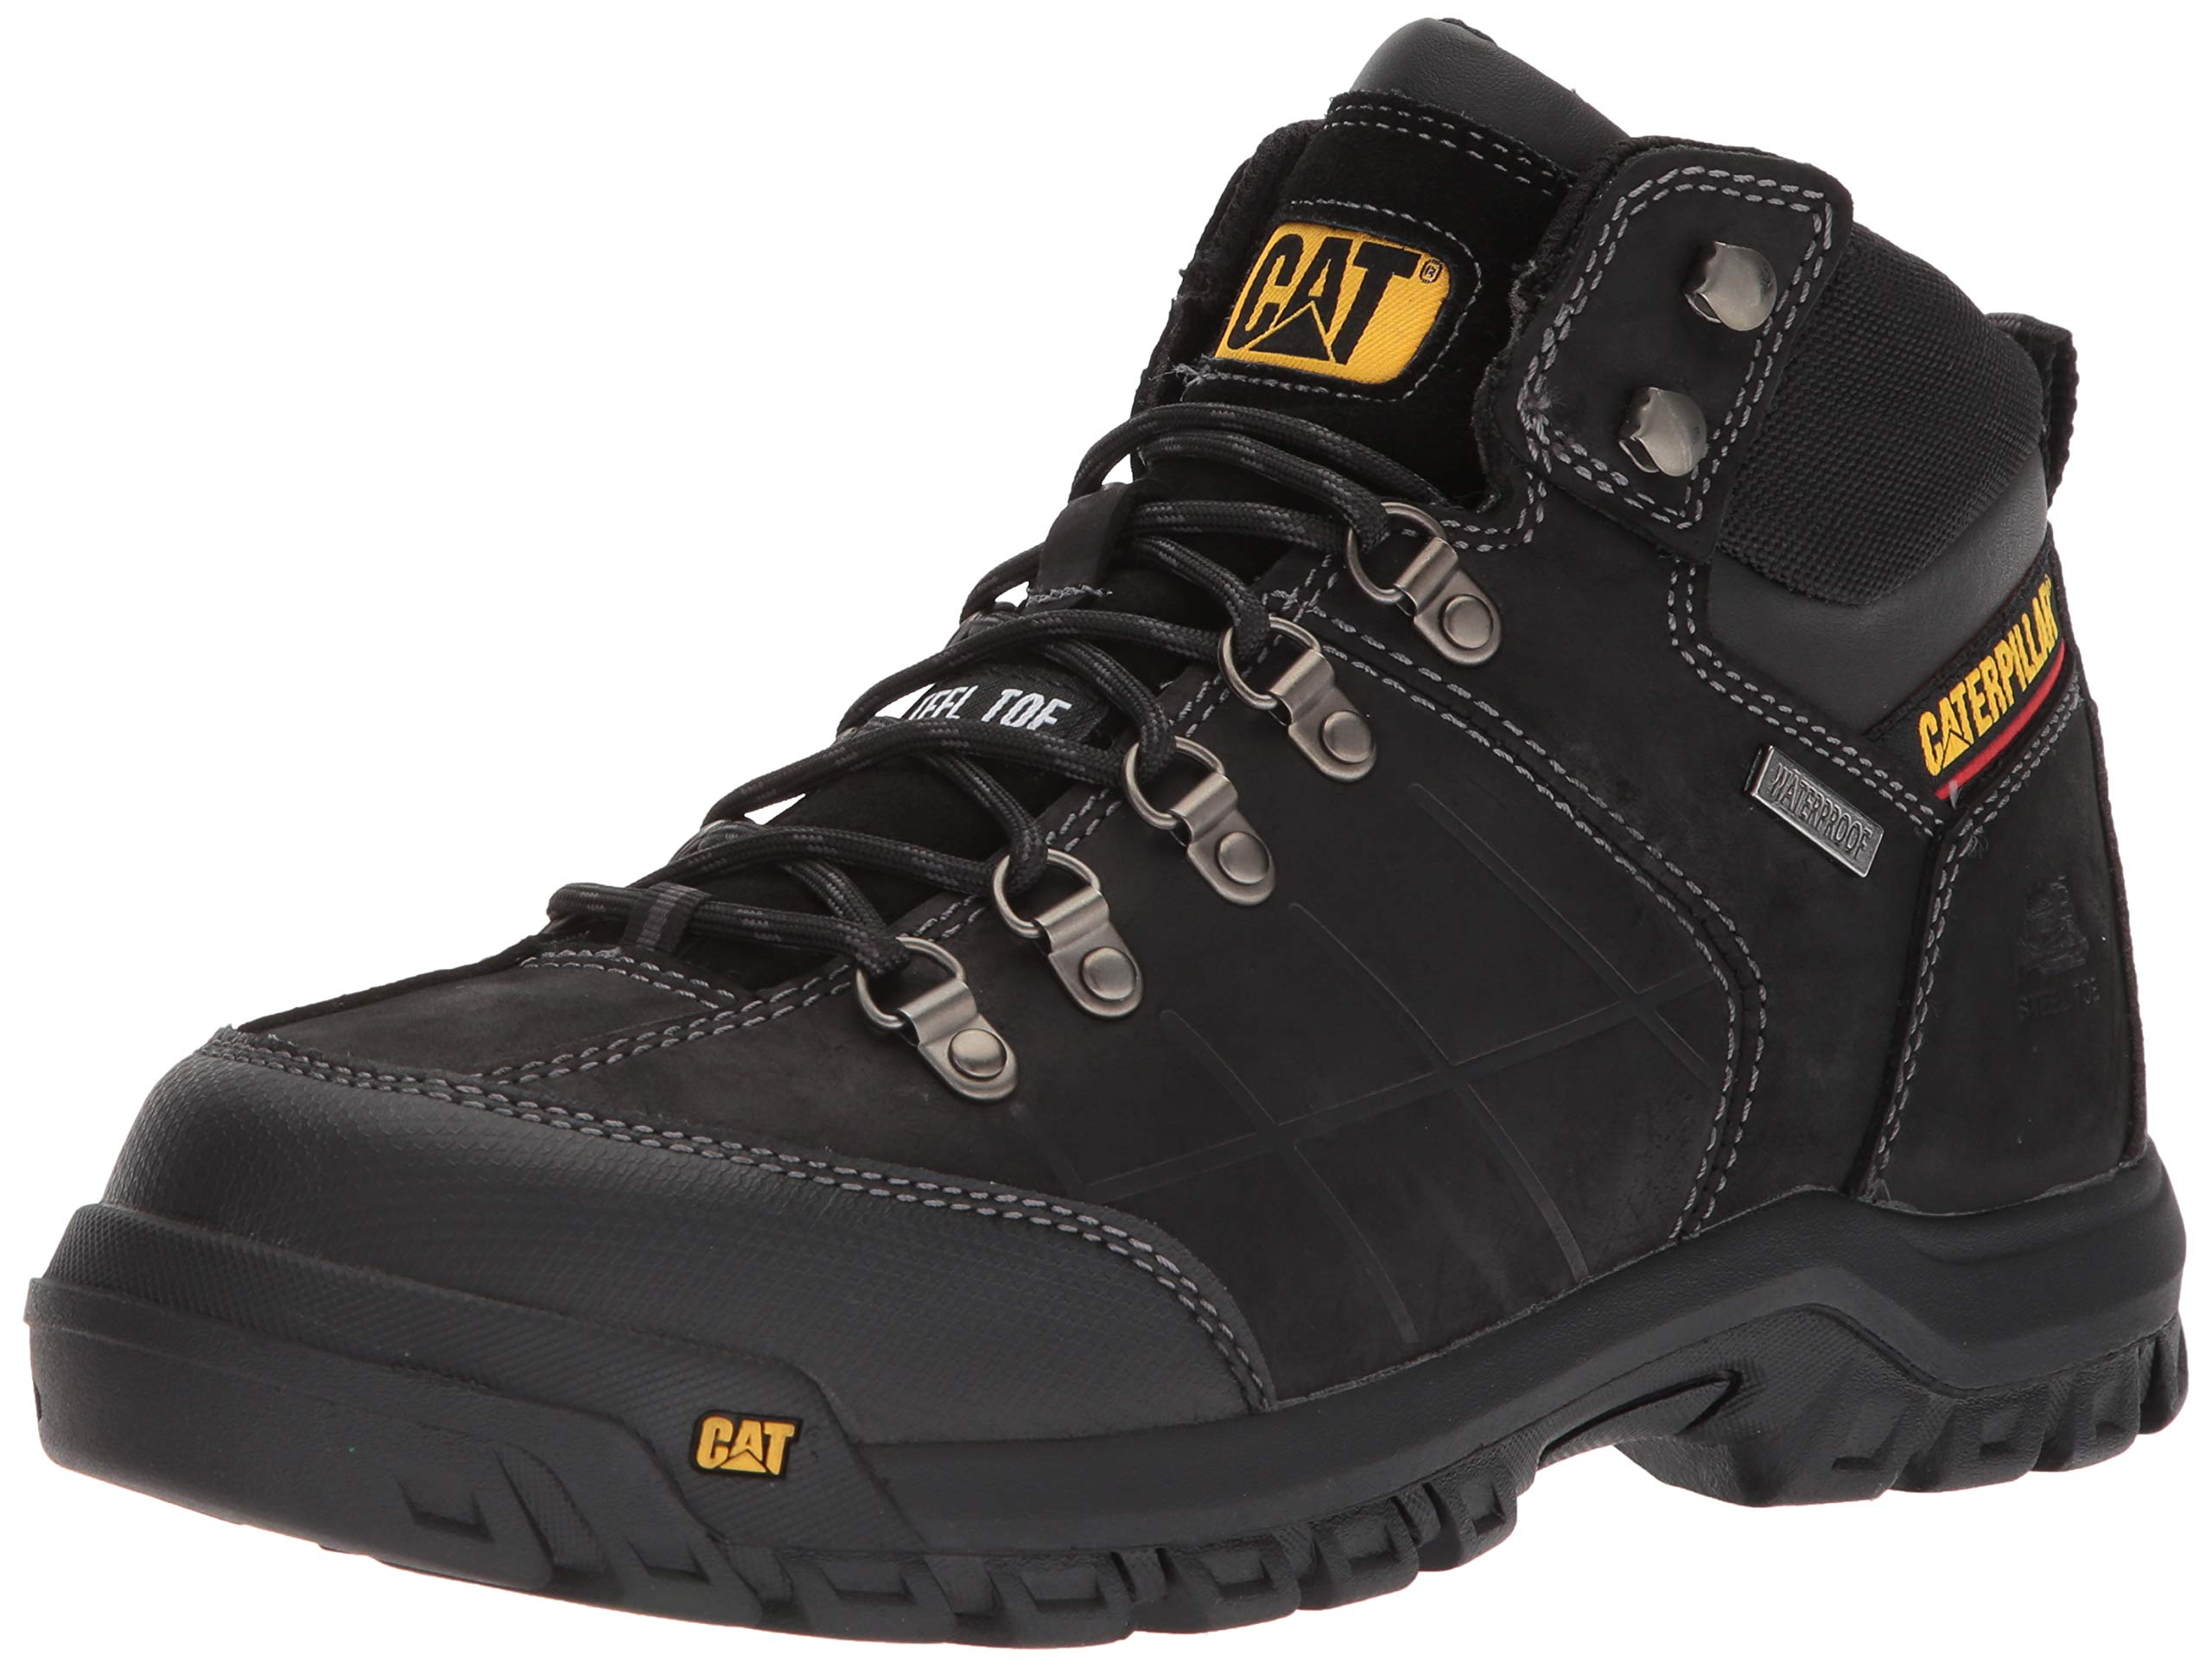 Caterpillar Men's Threshold Waterproof Steel Toe Industrial Boot, Black, 10.5 M US by Caterpillar